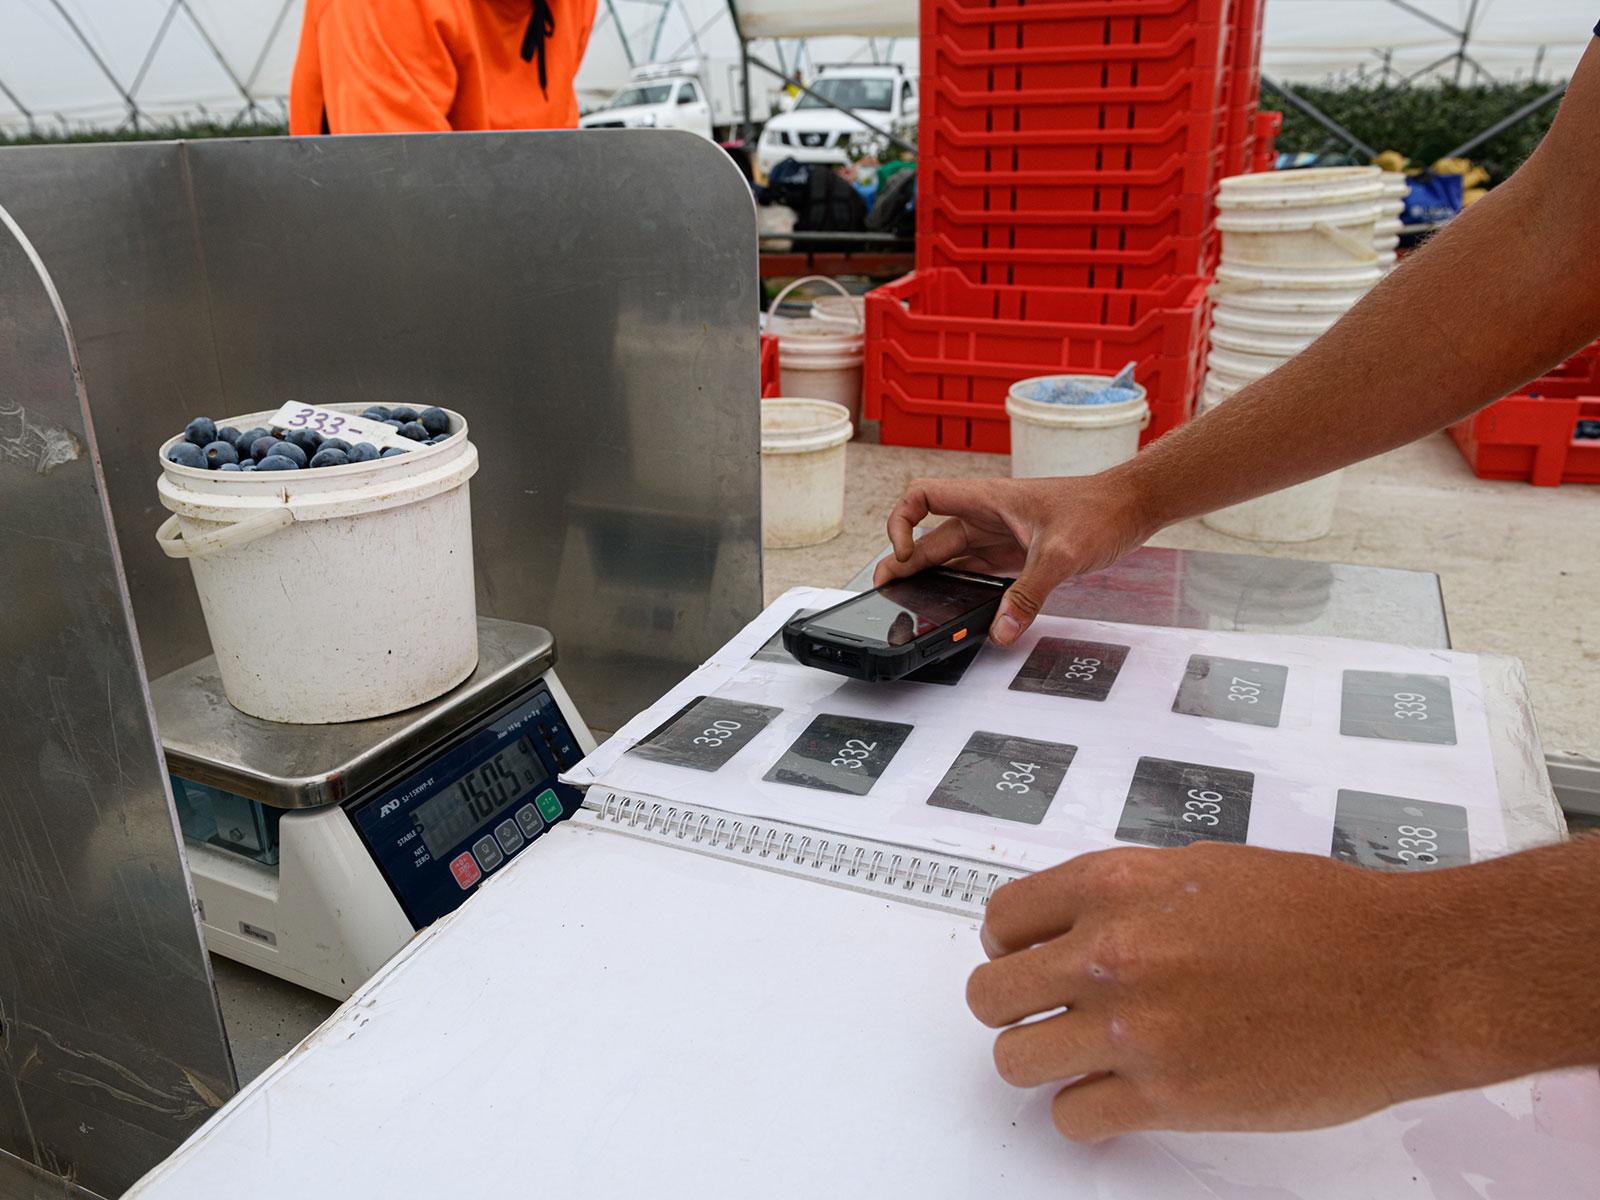 AgPick scanning a picker's identification